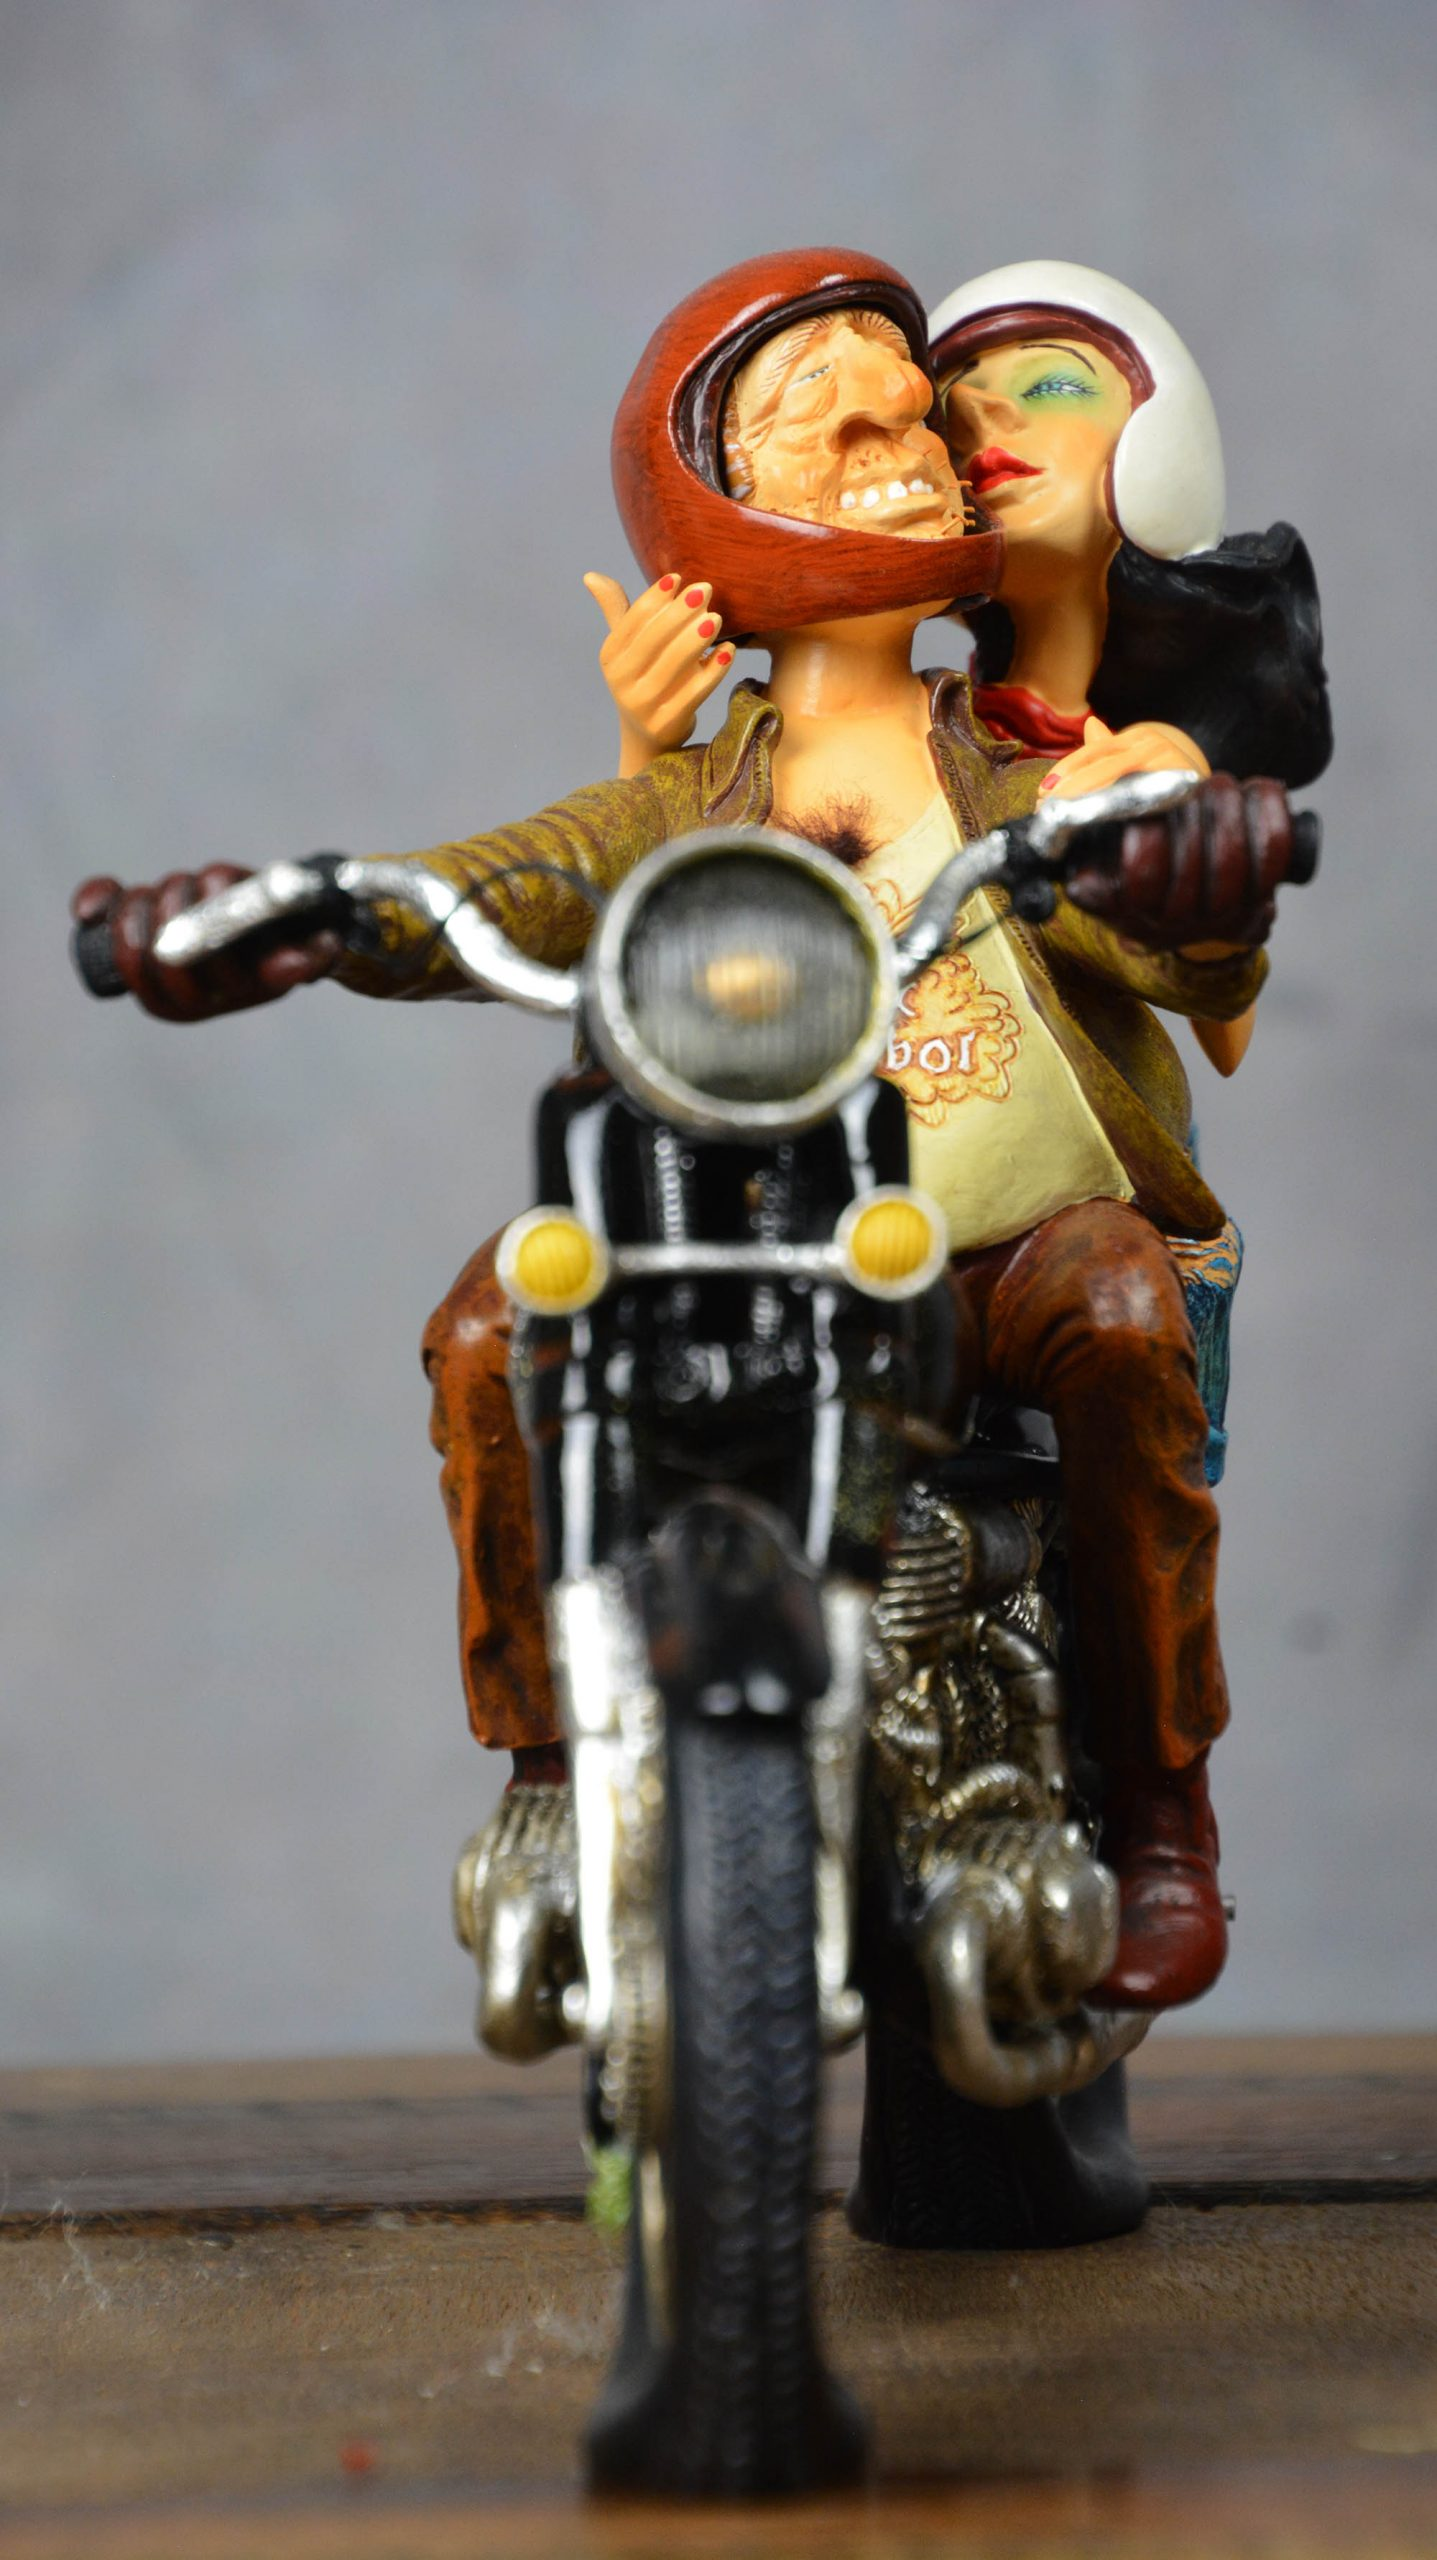 boutique figurine piece artisanale vehicule moto parodie